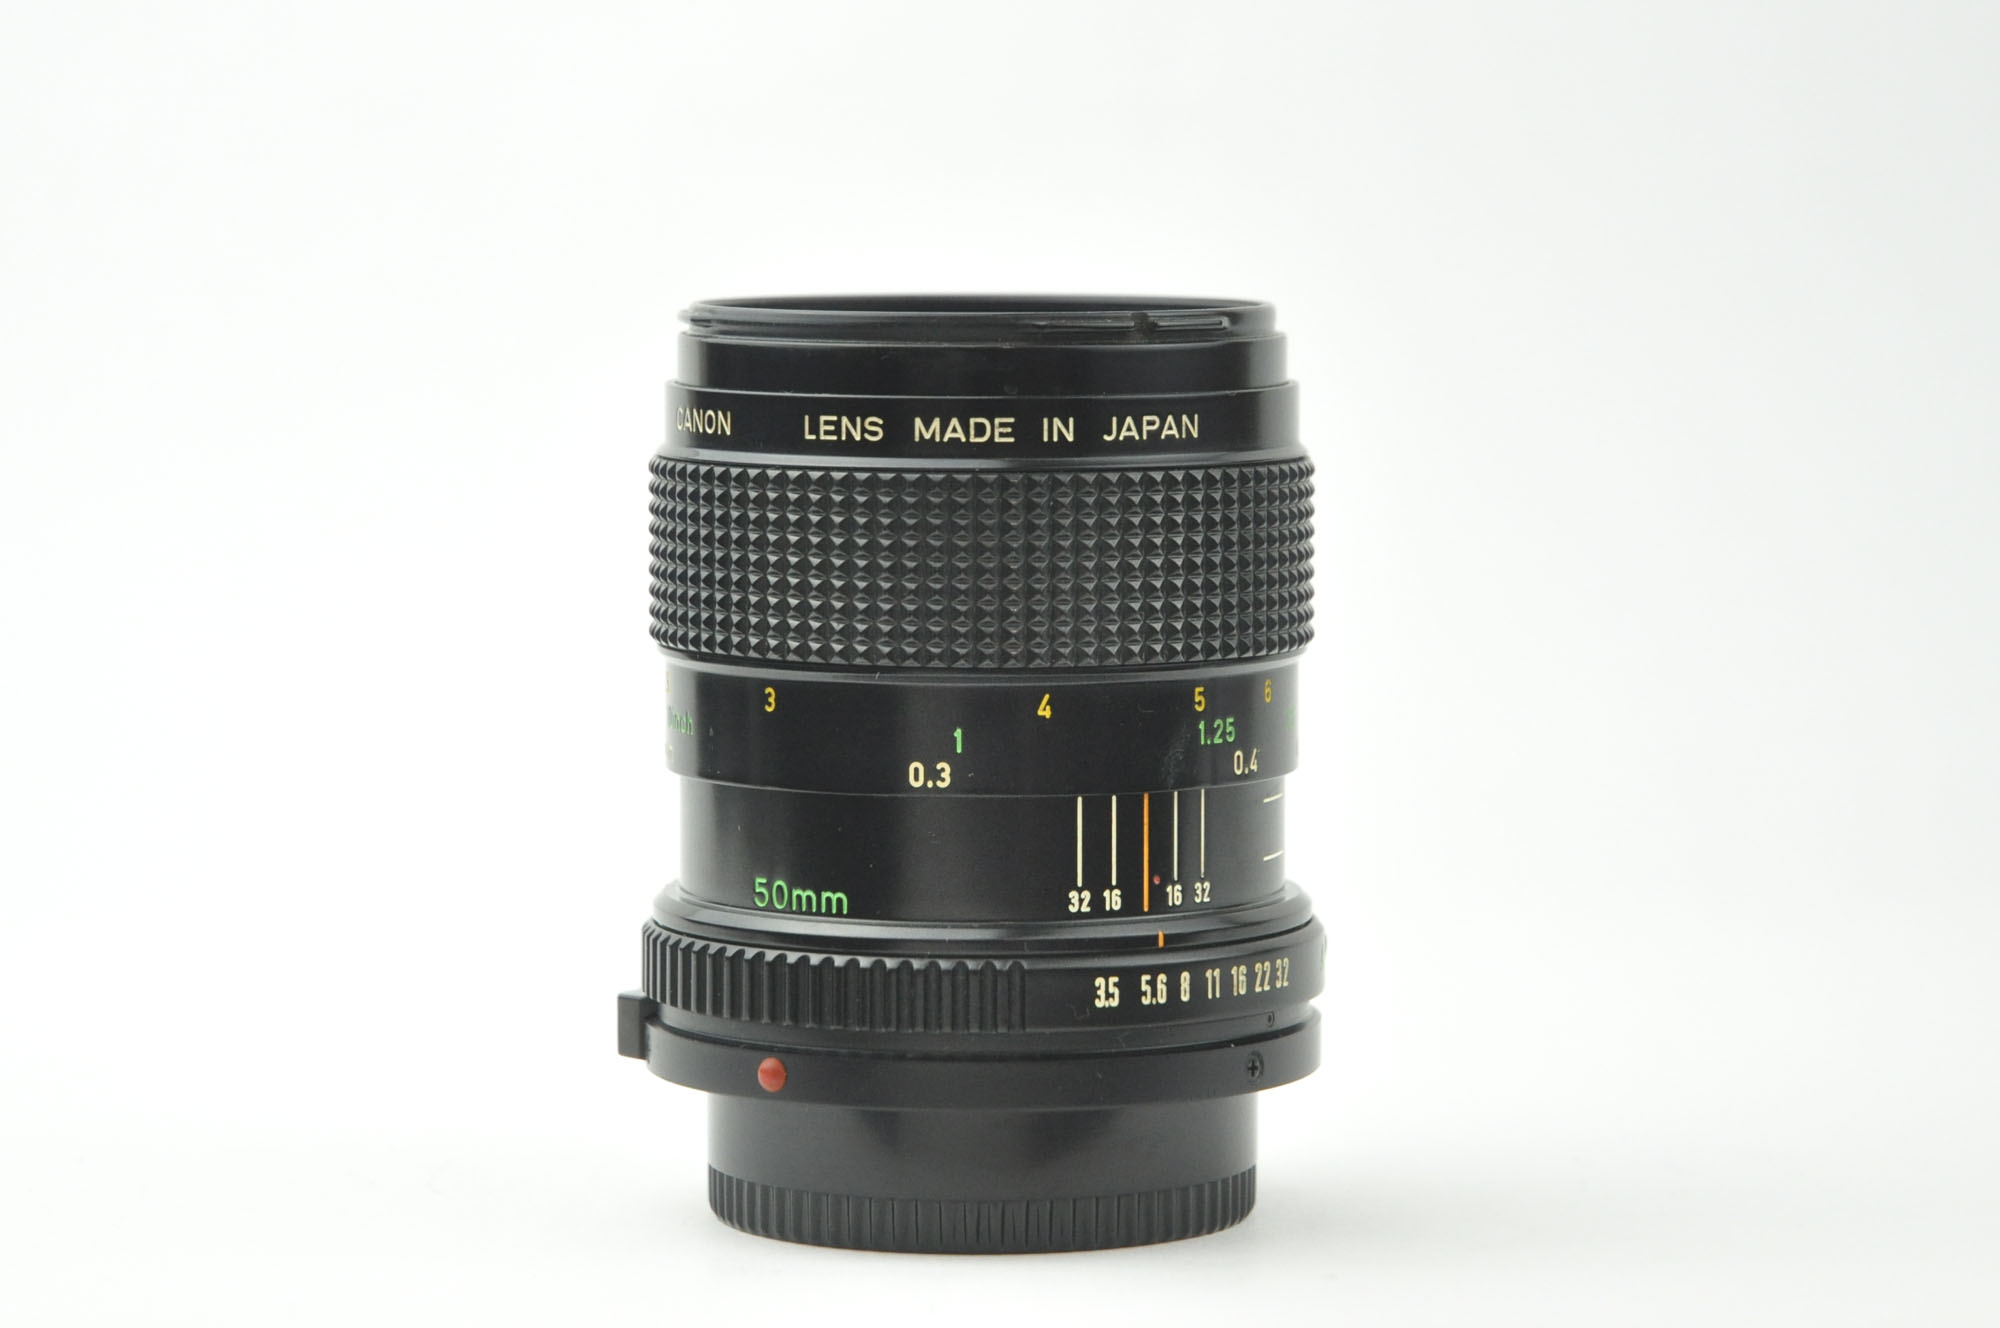 Canon macro 50mm f3.5 FD